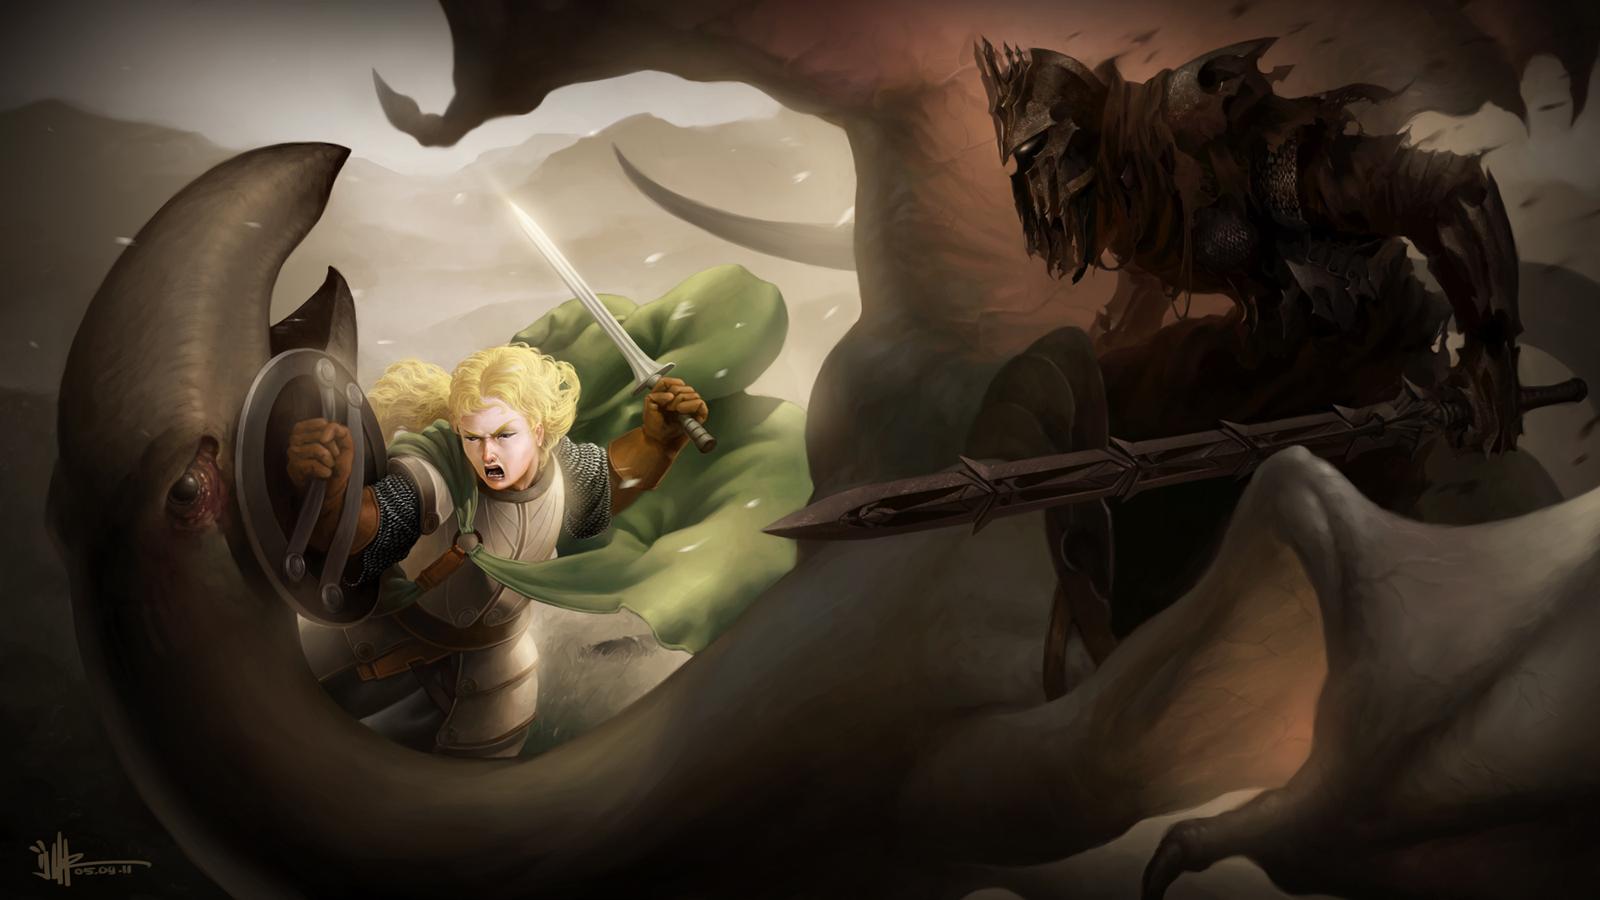 The Nazgul vd Eowyn